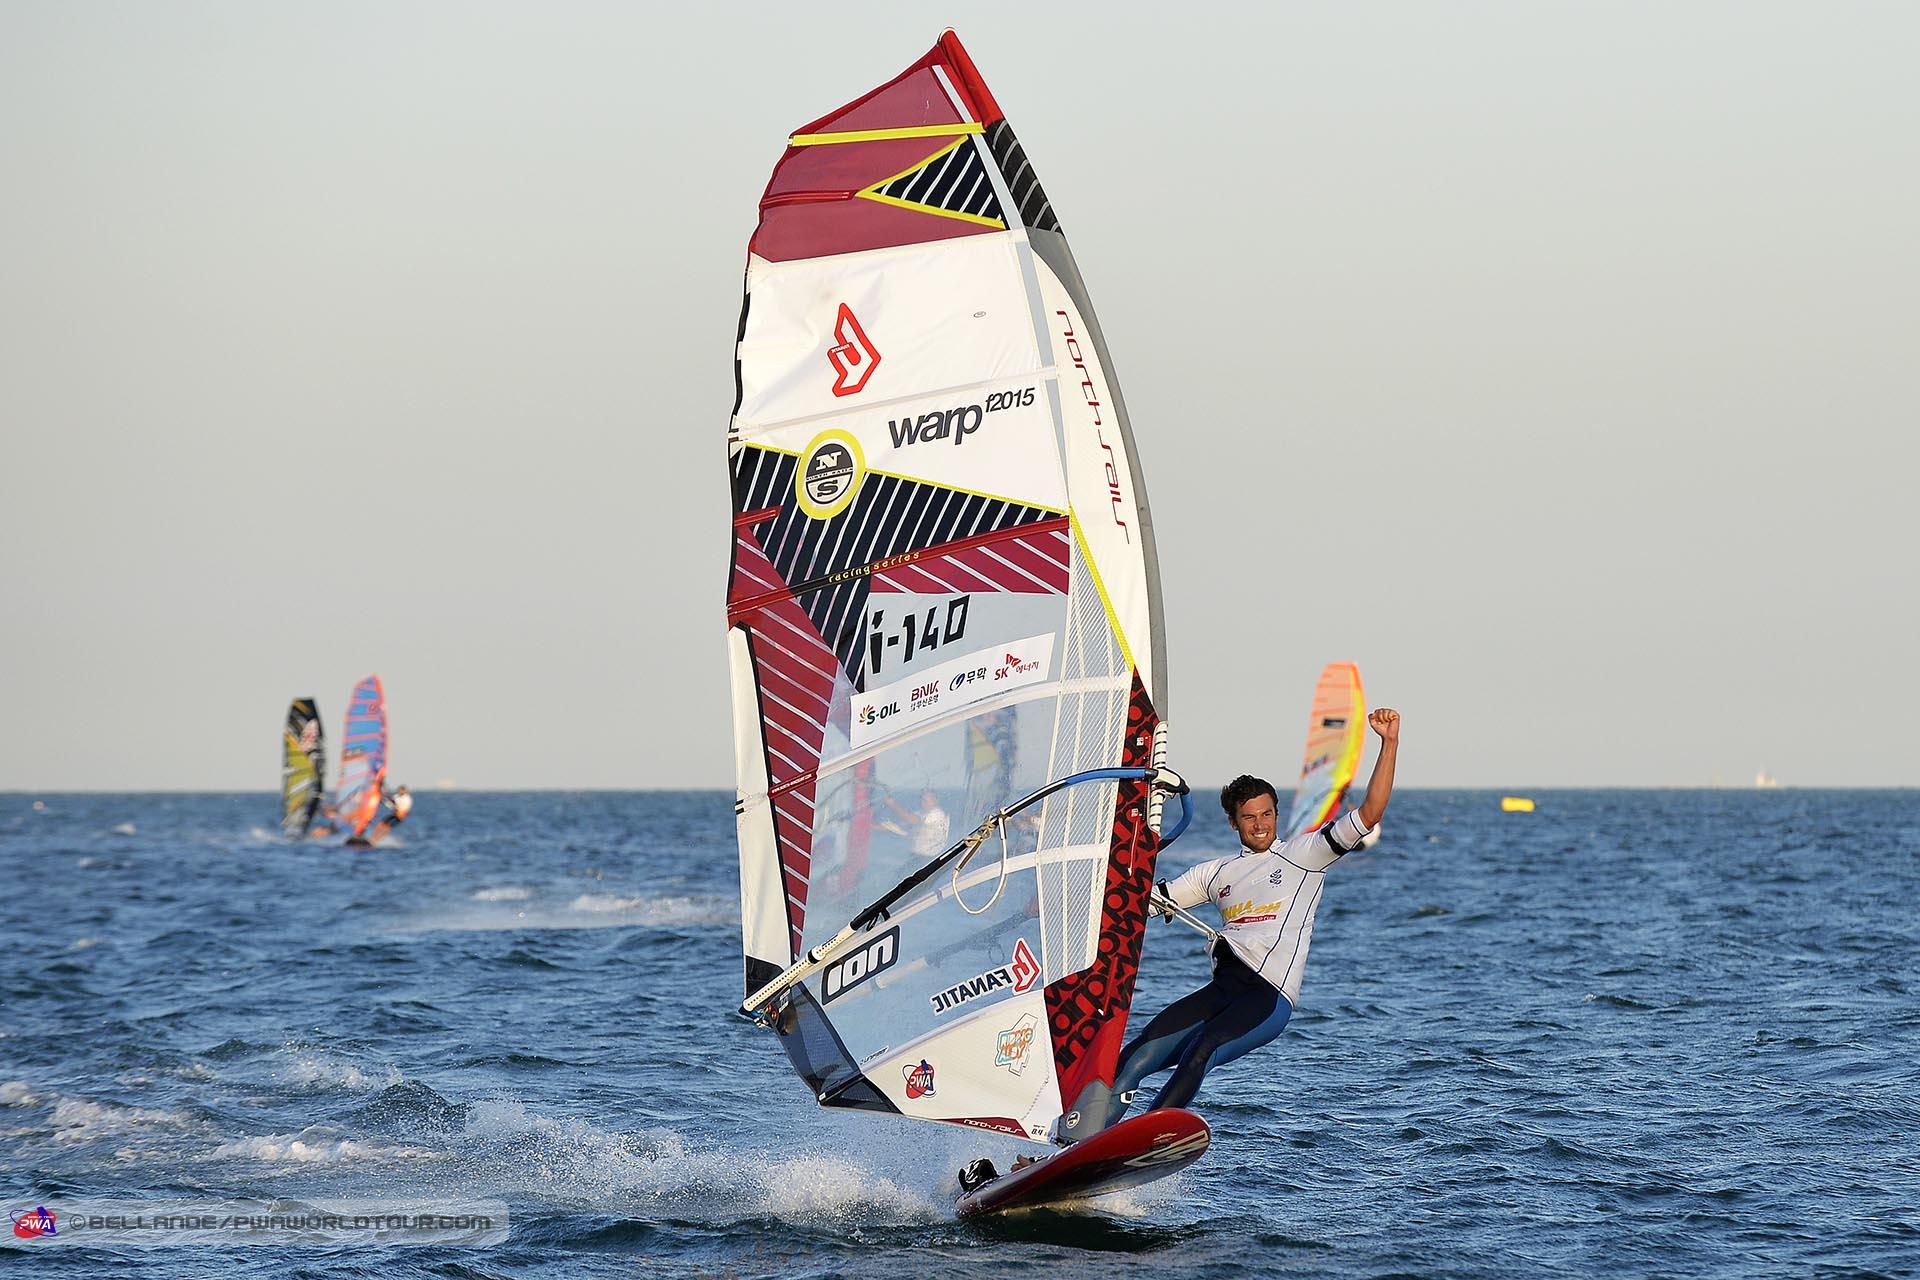 Matteo Iachino wins his first winners final